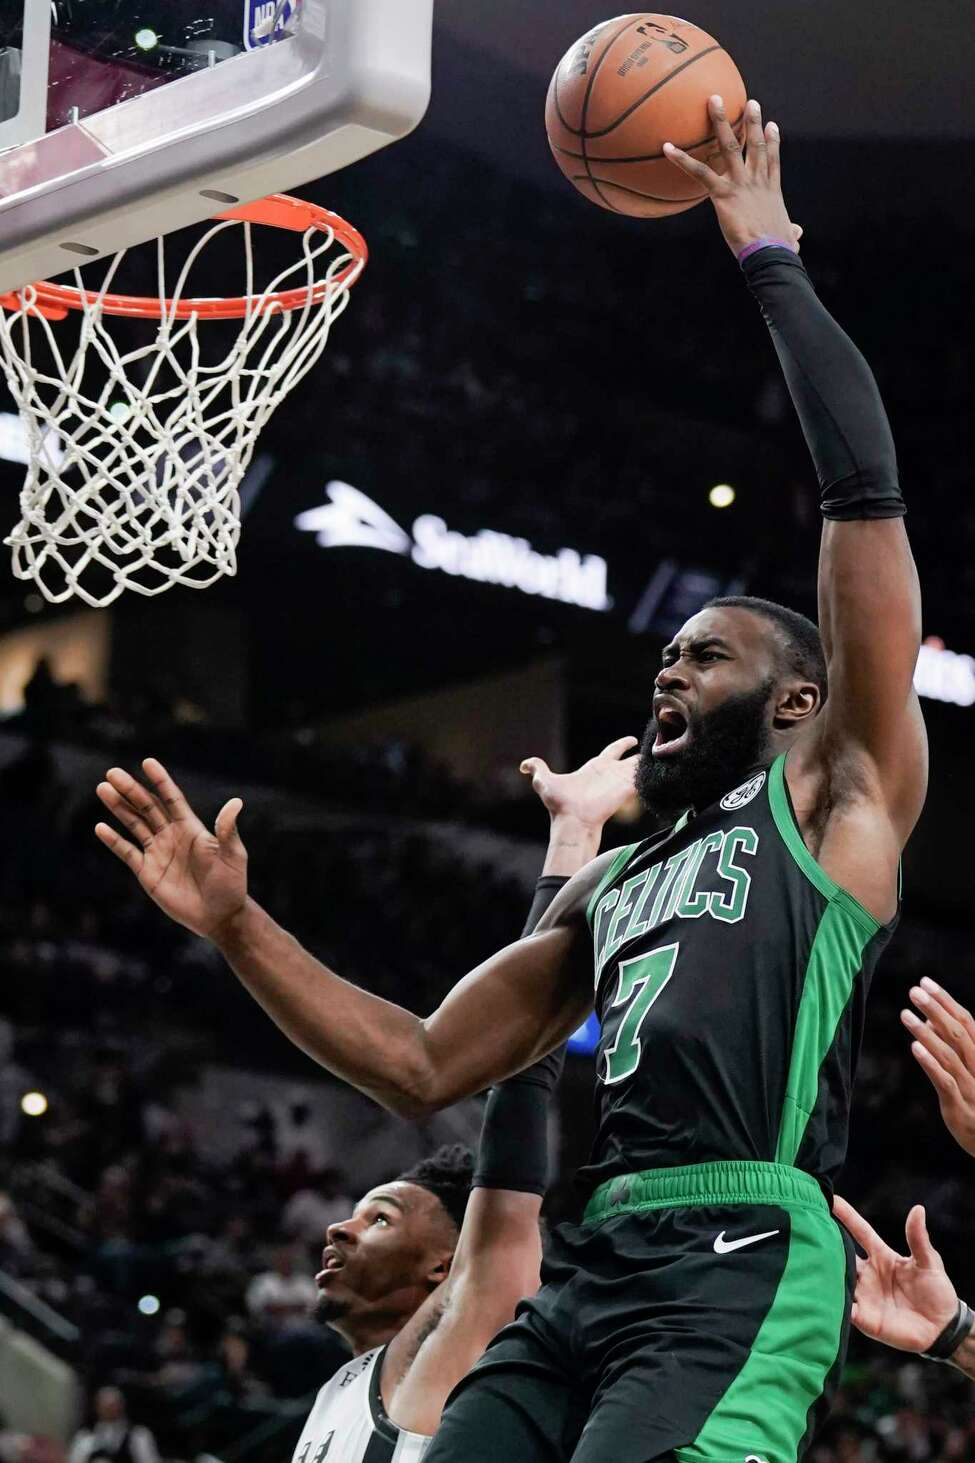 Boston Celtics' Jaylen Brown shoots during the second half of an NBA basketball game against the San Antonio Spurs, Saturday, Nov. 9, 2019, in San Antonio. (AP Photo/Darren Abate)